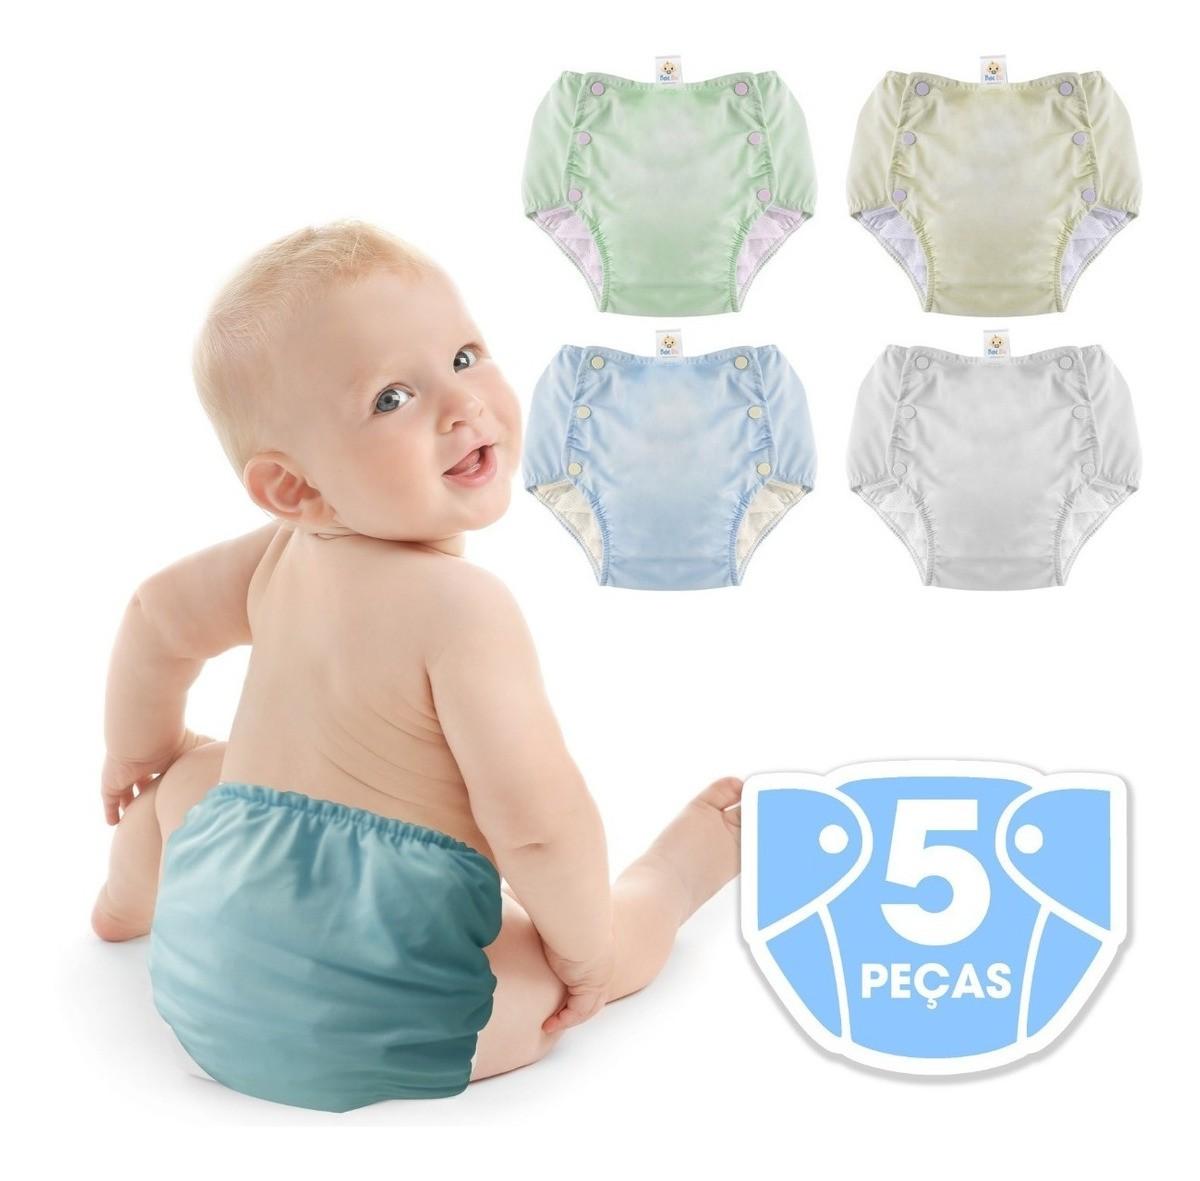 Bebê Fralda Enxuta Reutilizável Calça Plástica Ecológica kit menino